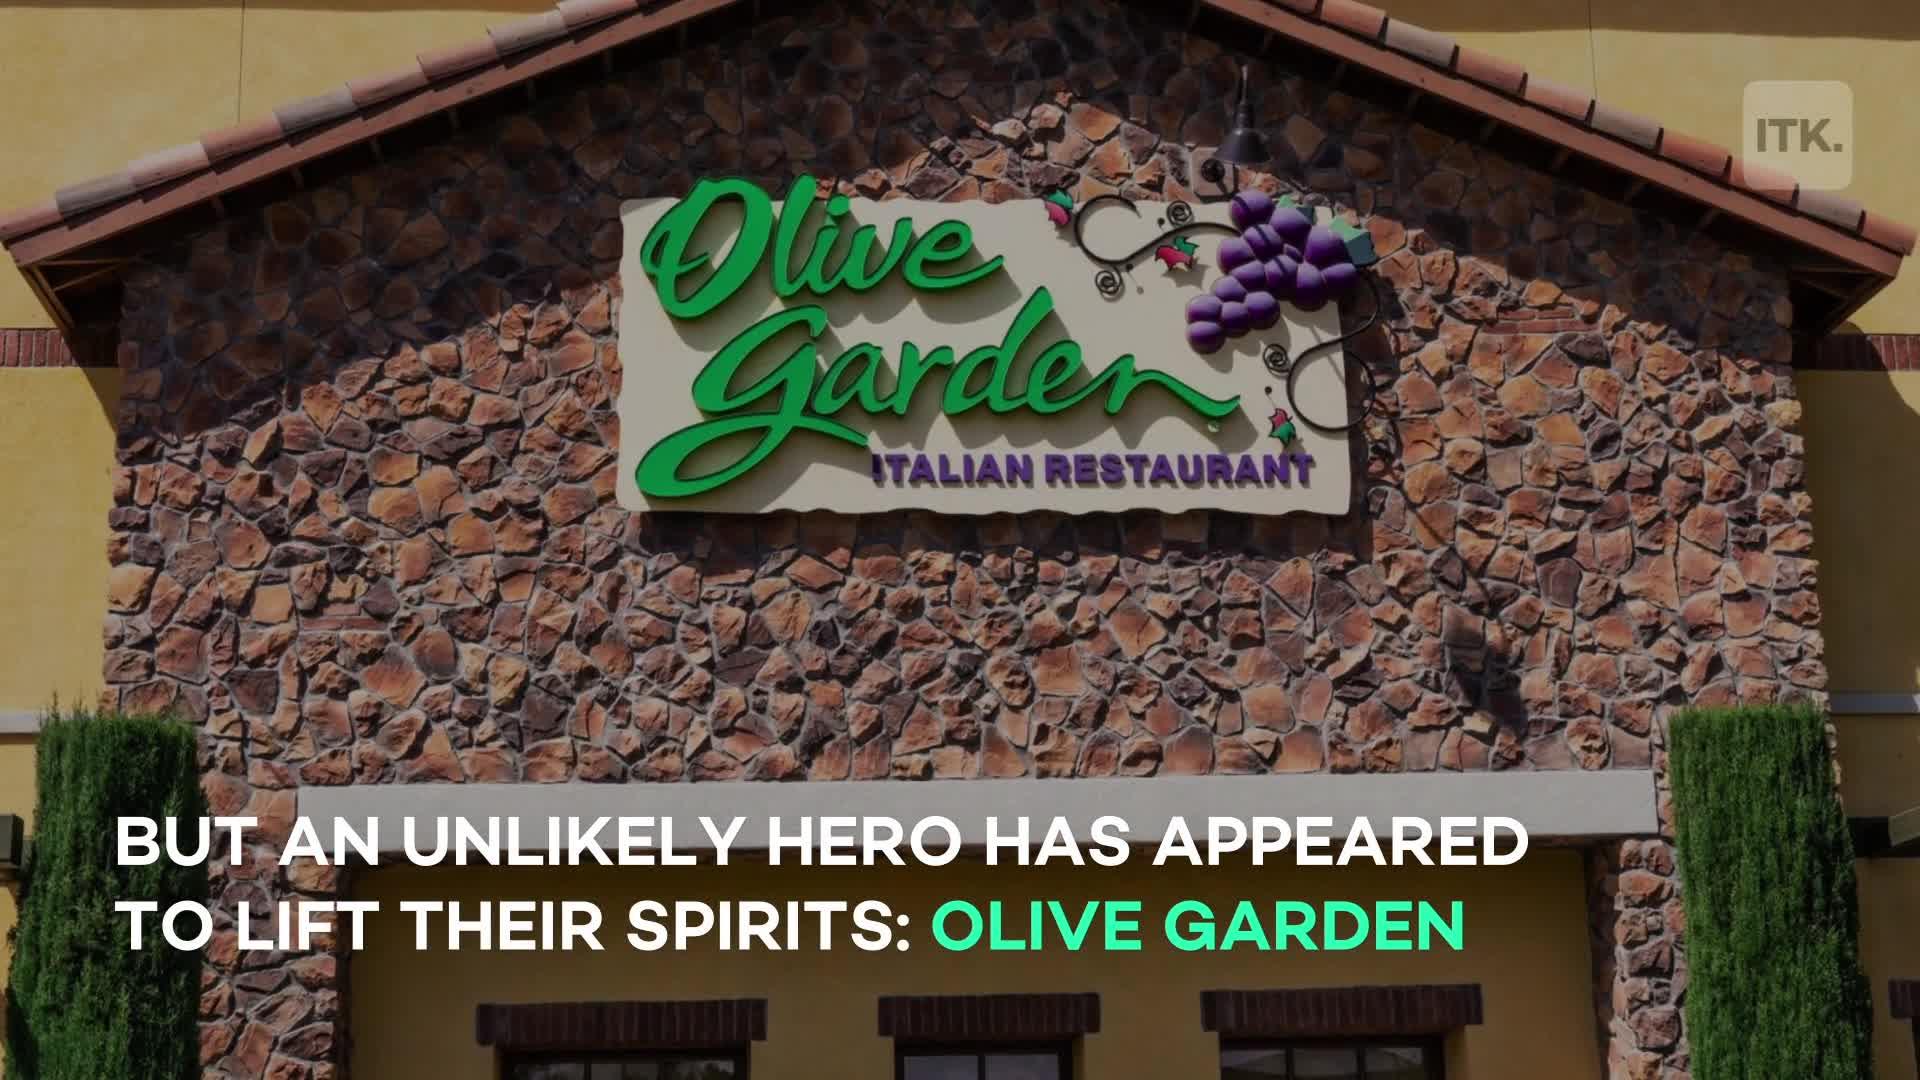 Olive Garden Creates Hilarious Prom Photos